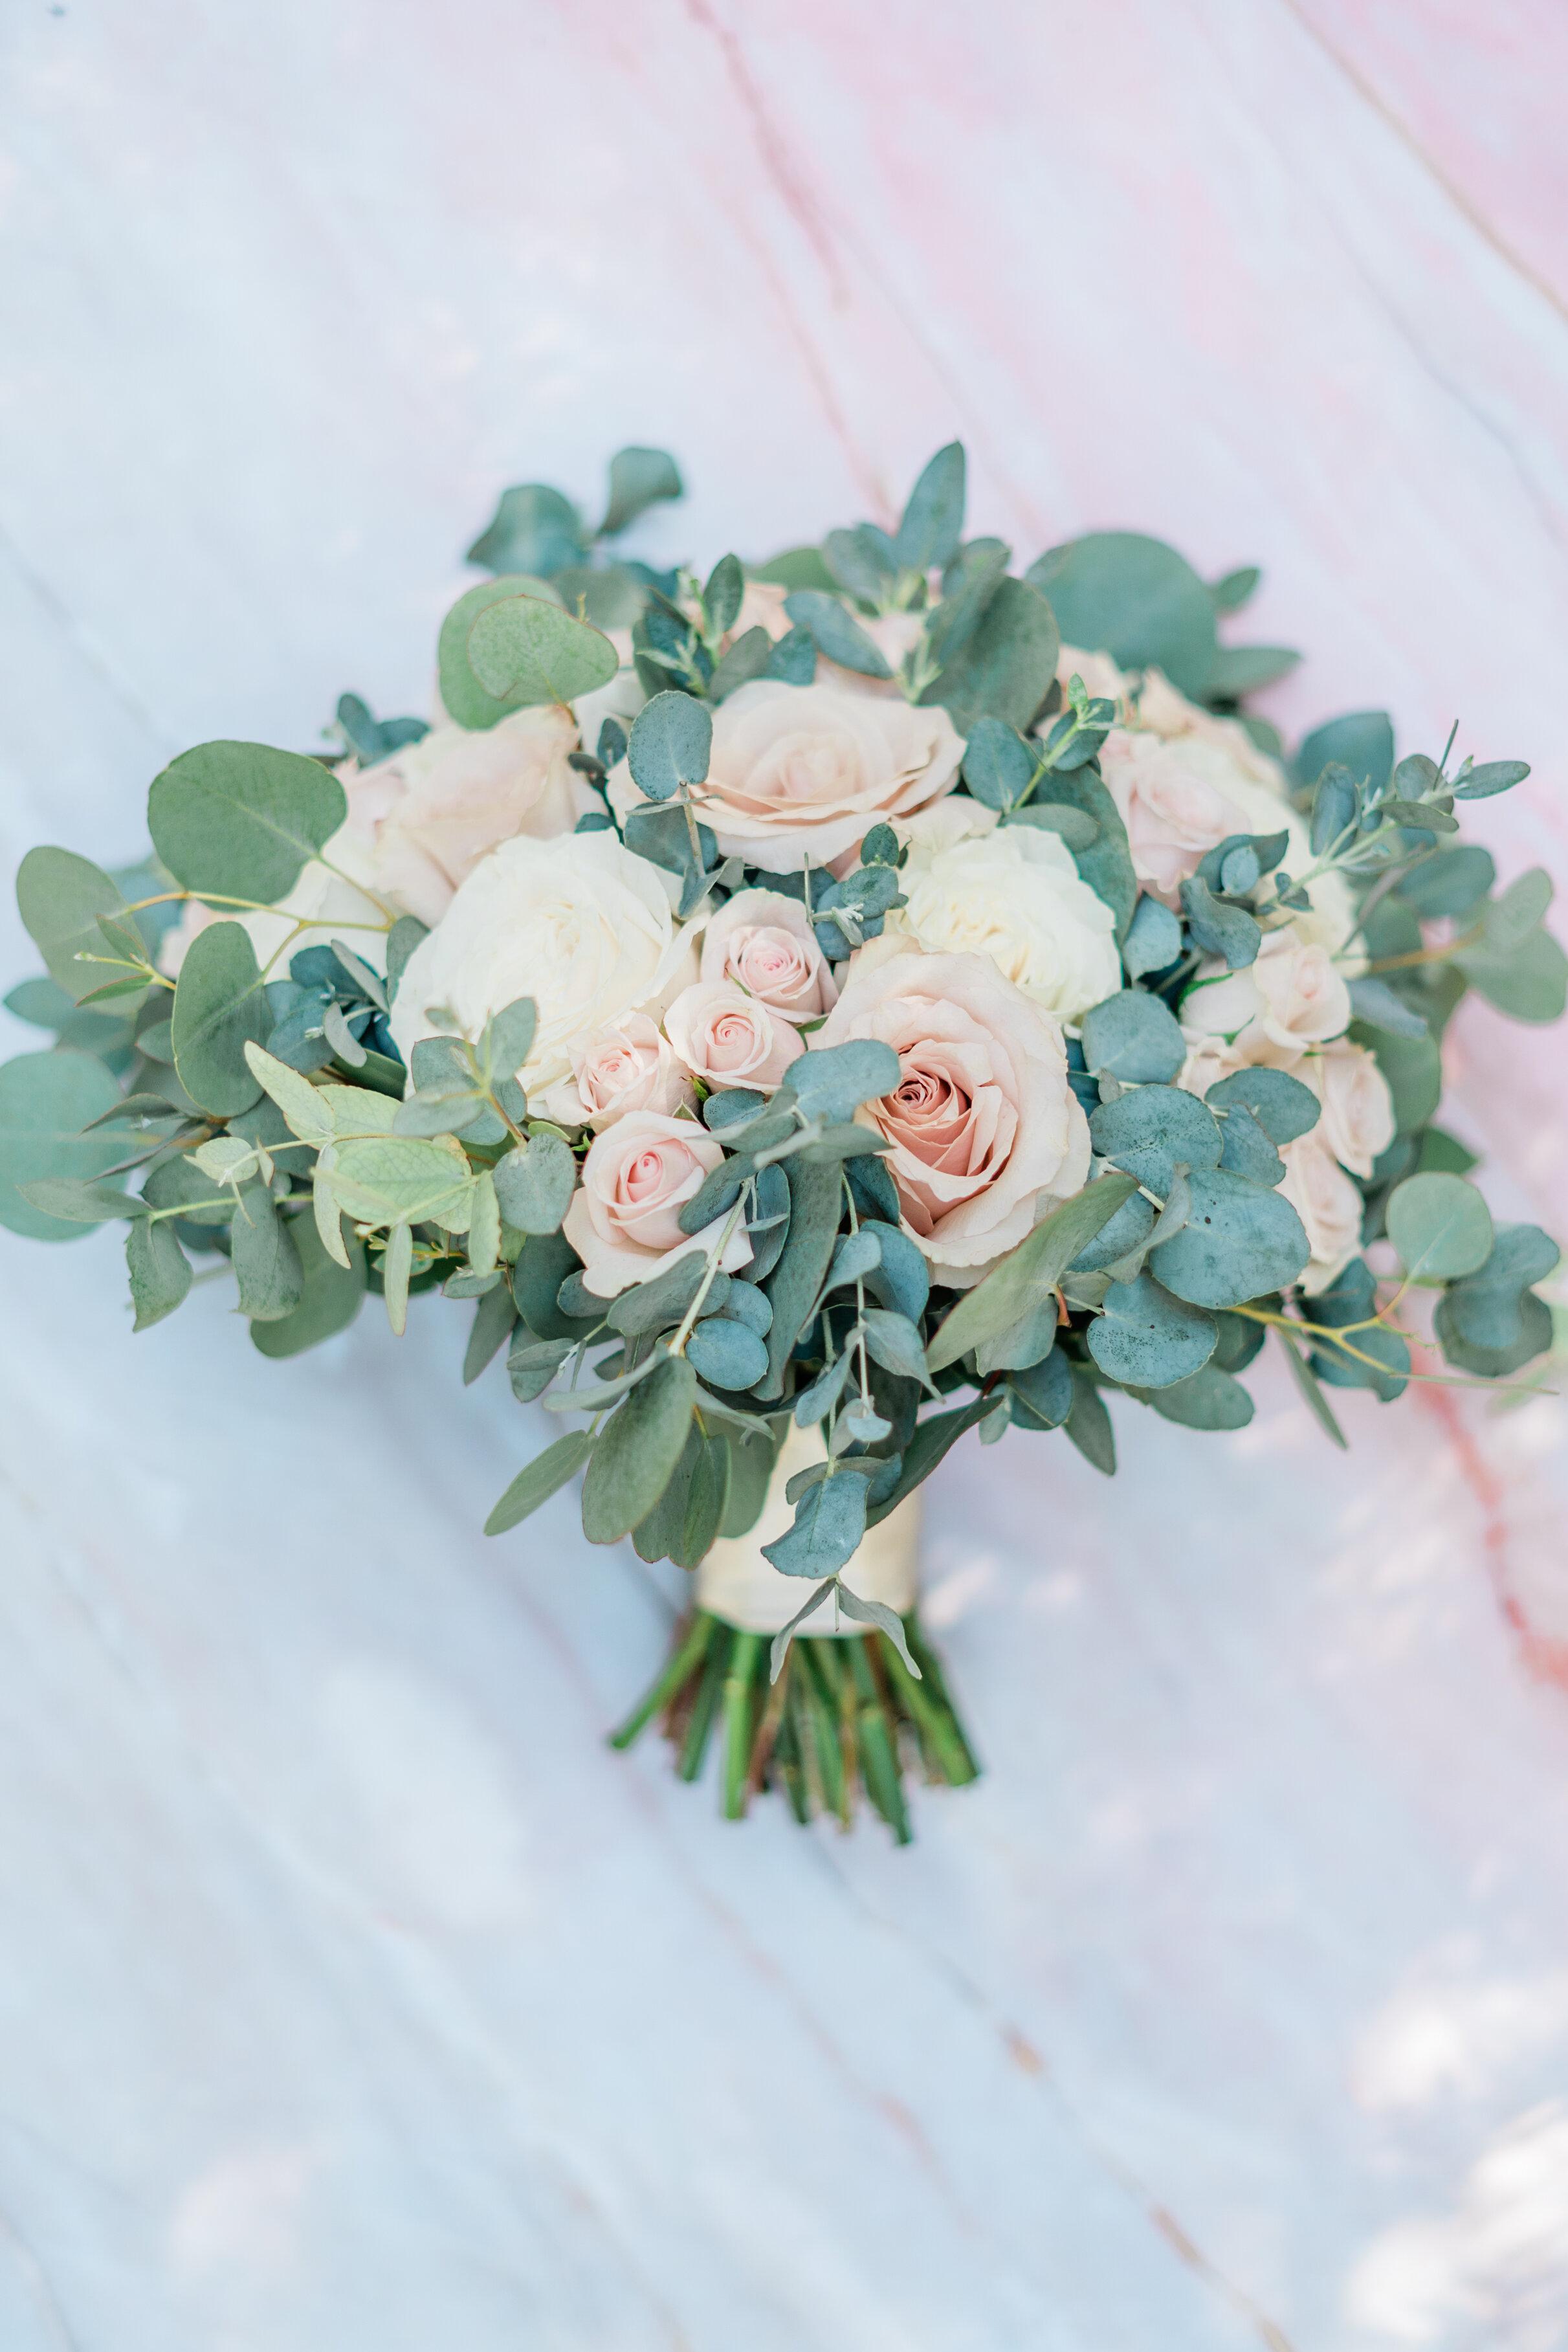 Leanne and Joe - Married - Sneak Peeks - Lauren Alisse Photography-2.jpg